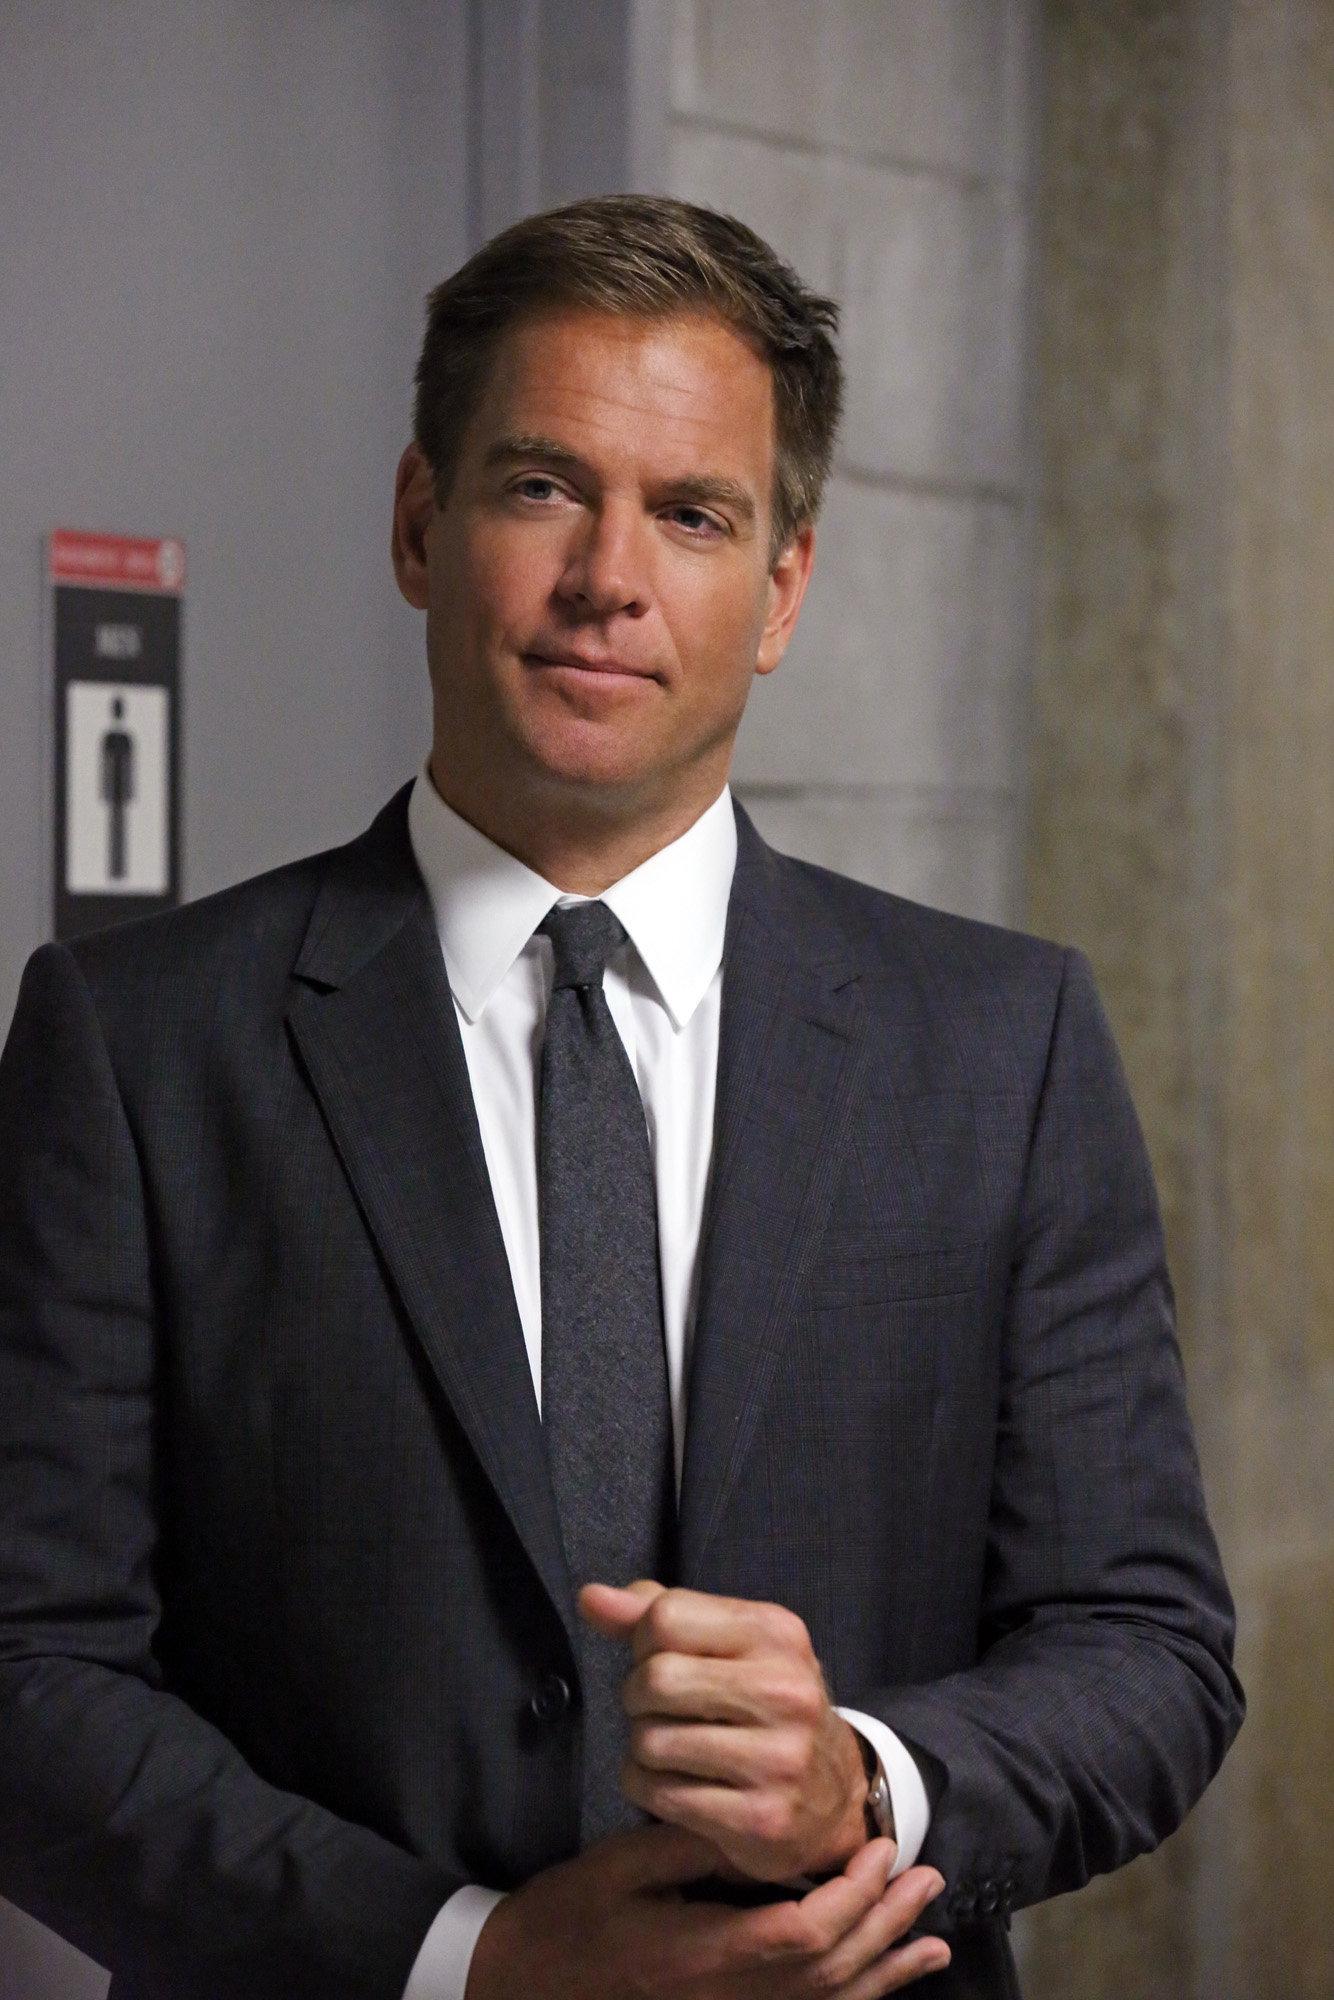 CBS: Αποζημίωση 9,5 εκατ. σε ηθοποιό, για τα σχόλια σταρ του